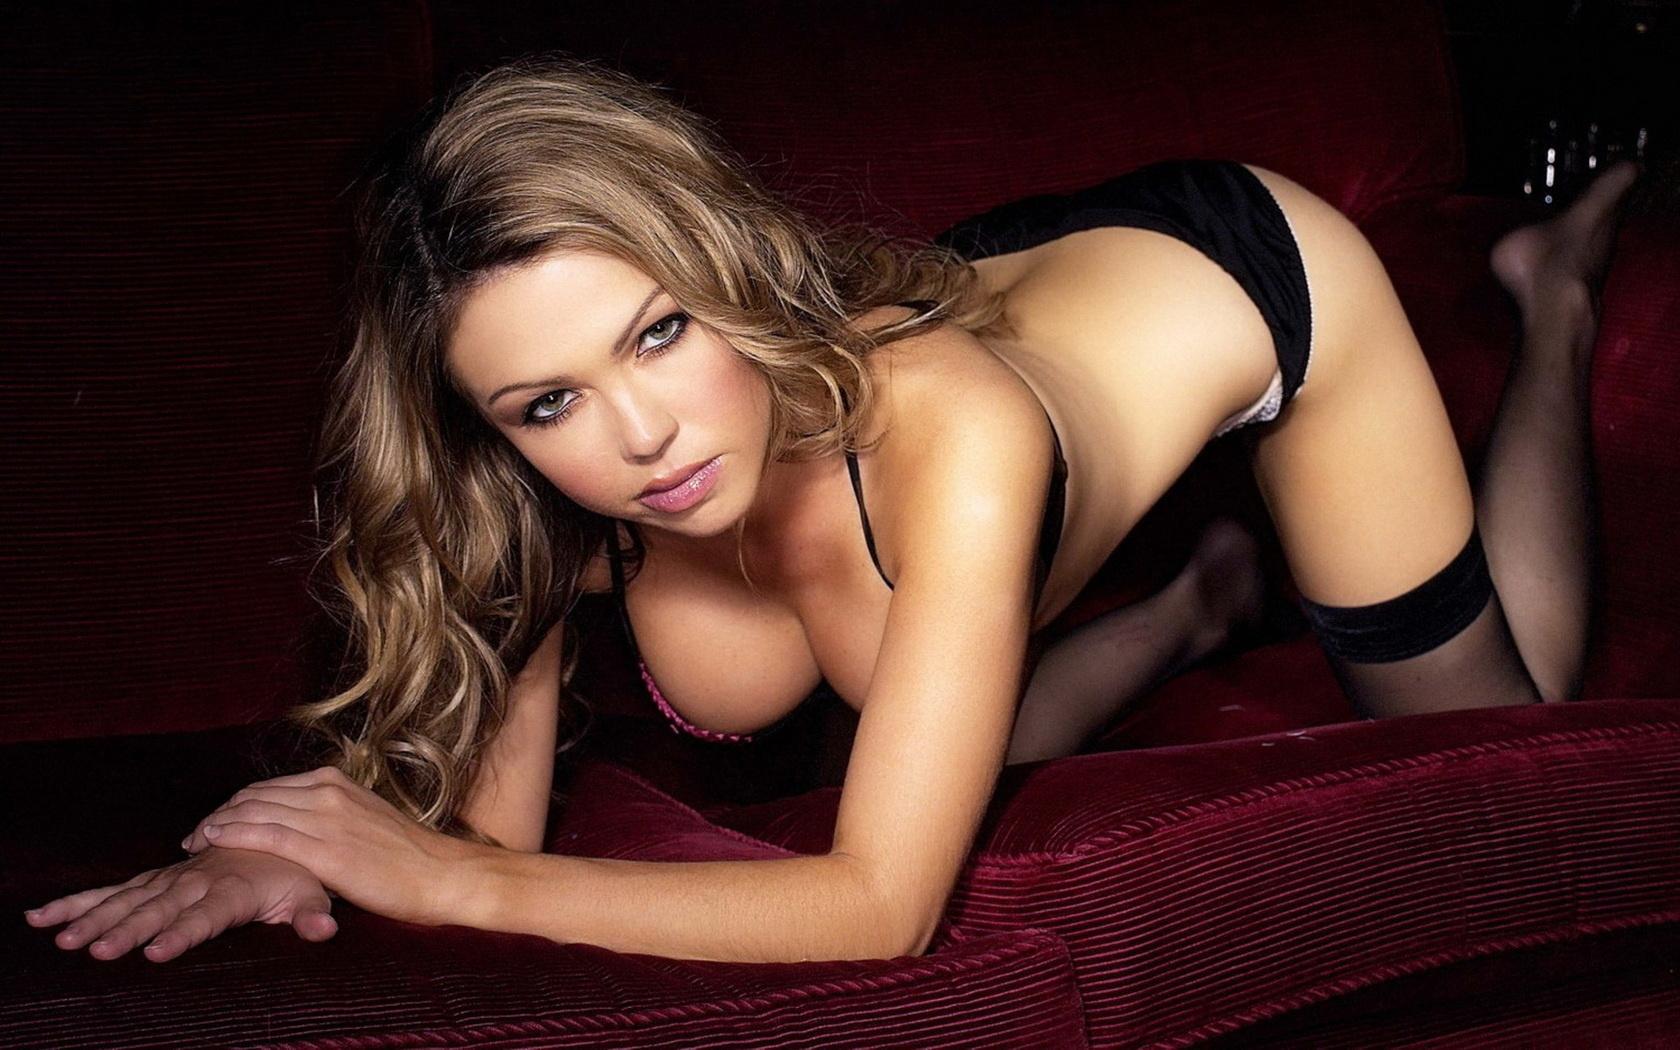 Pornesite photos, russain school girl sexy fucking pic